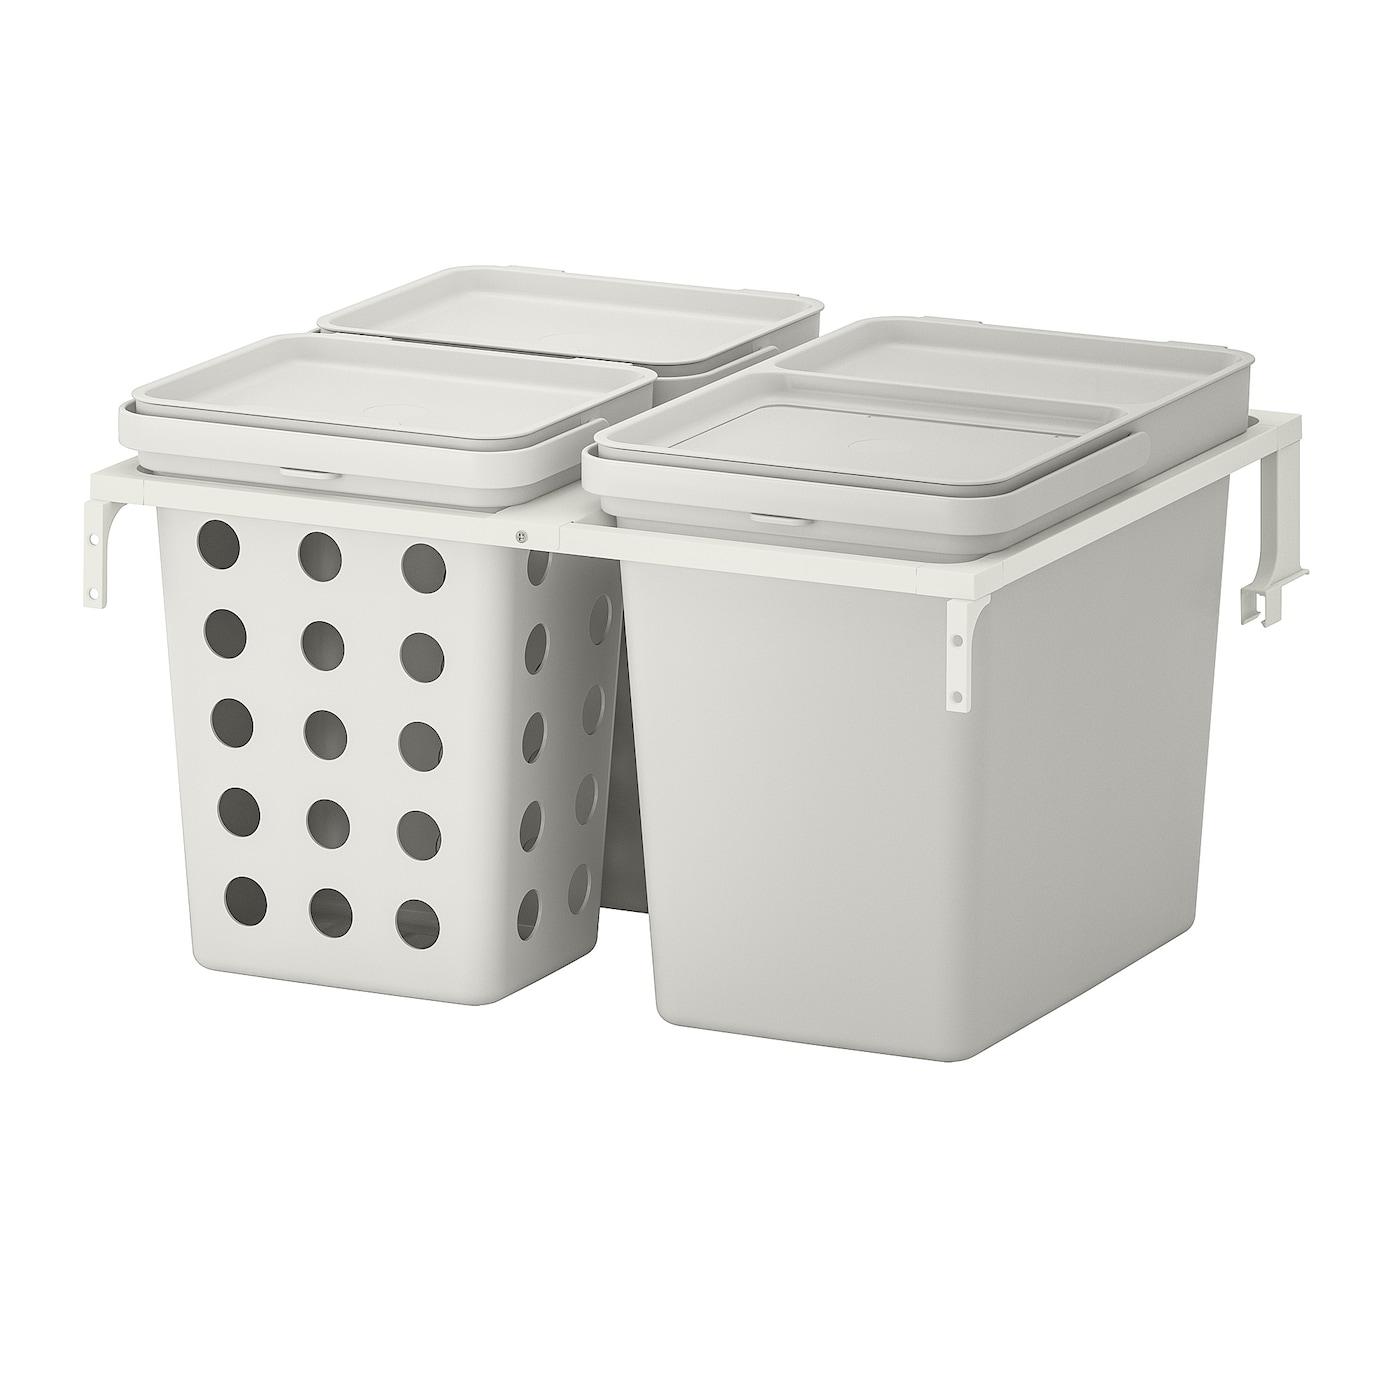 Hallbar Waste Sorting Solution For Metod Kitchen Drawer